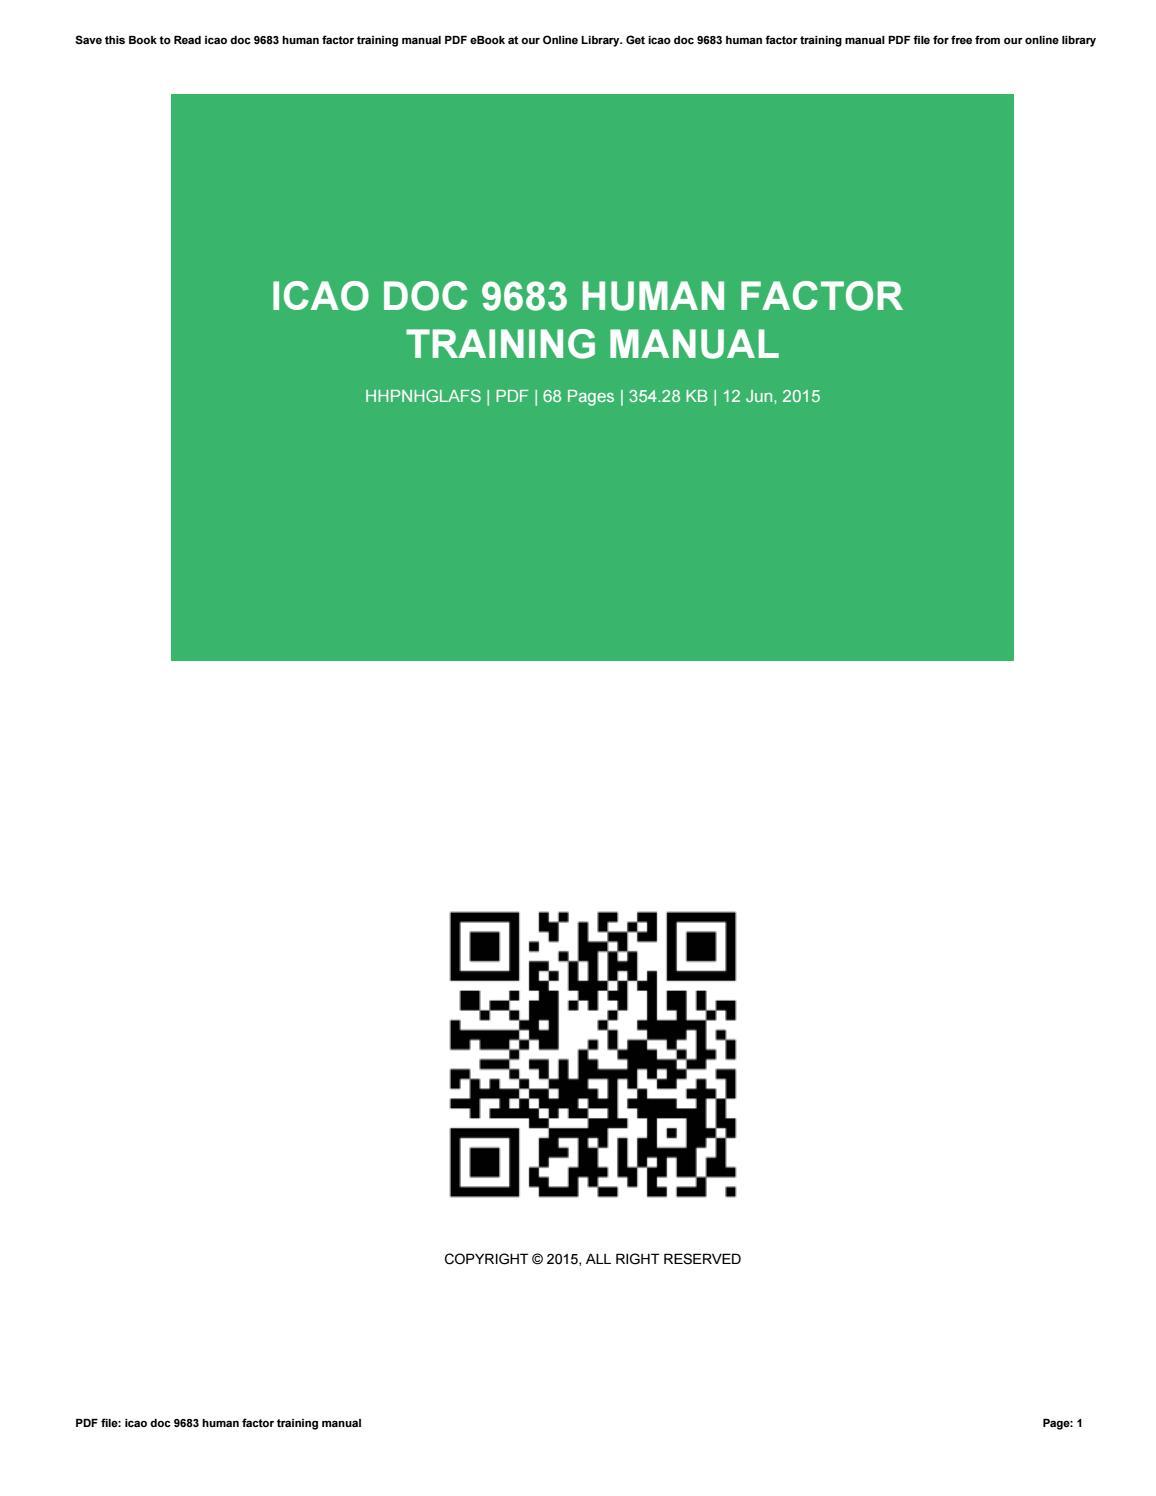 icao doc 9683 human factor training manual by jeanwilkes3611 issuu rh issuu com Human Factors Engineering icao human factors training manual doc 9683 download